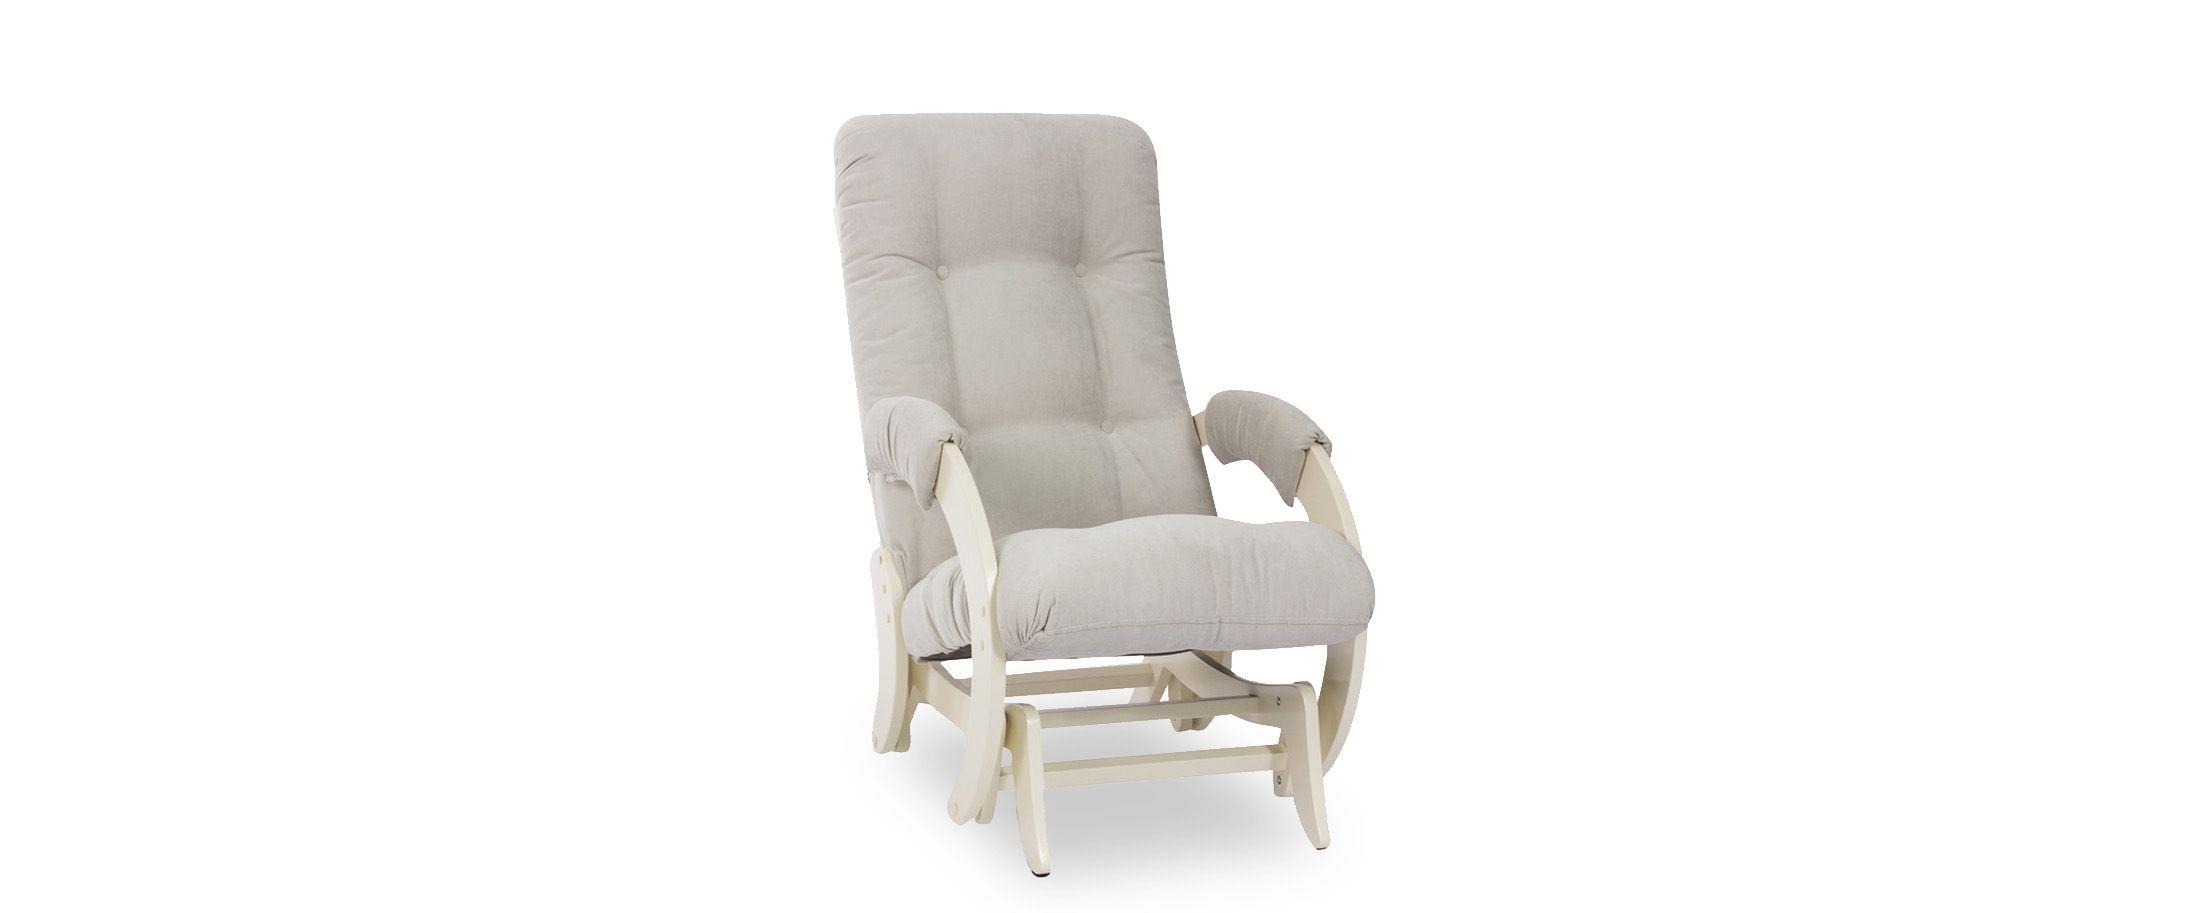 Кресло-гляйдер 68 VeronaVanilla